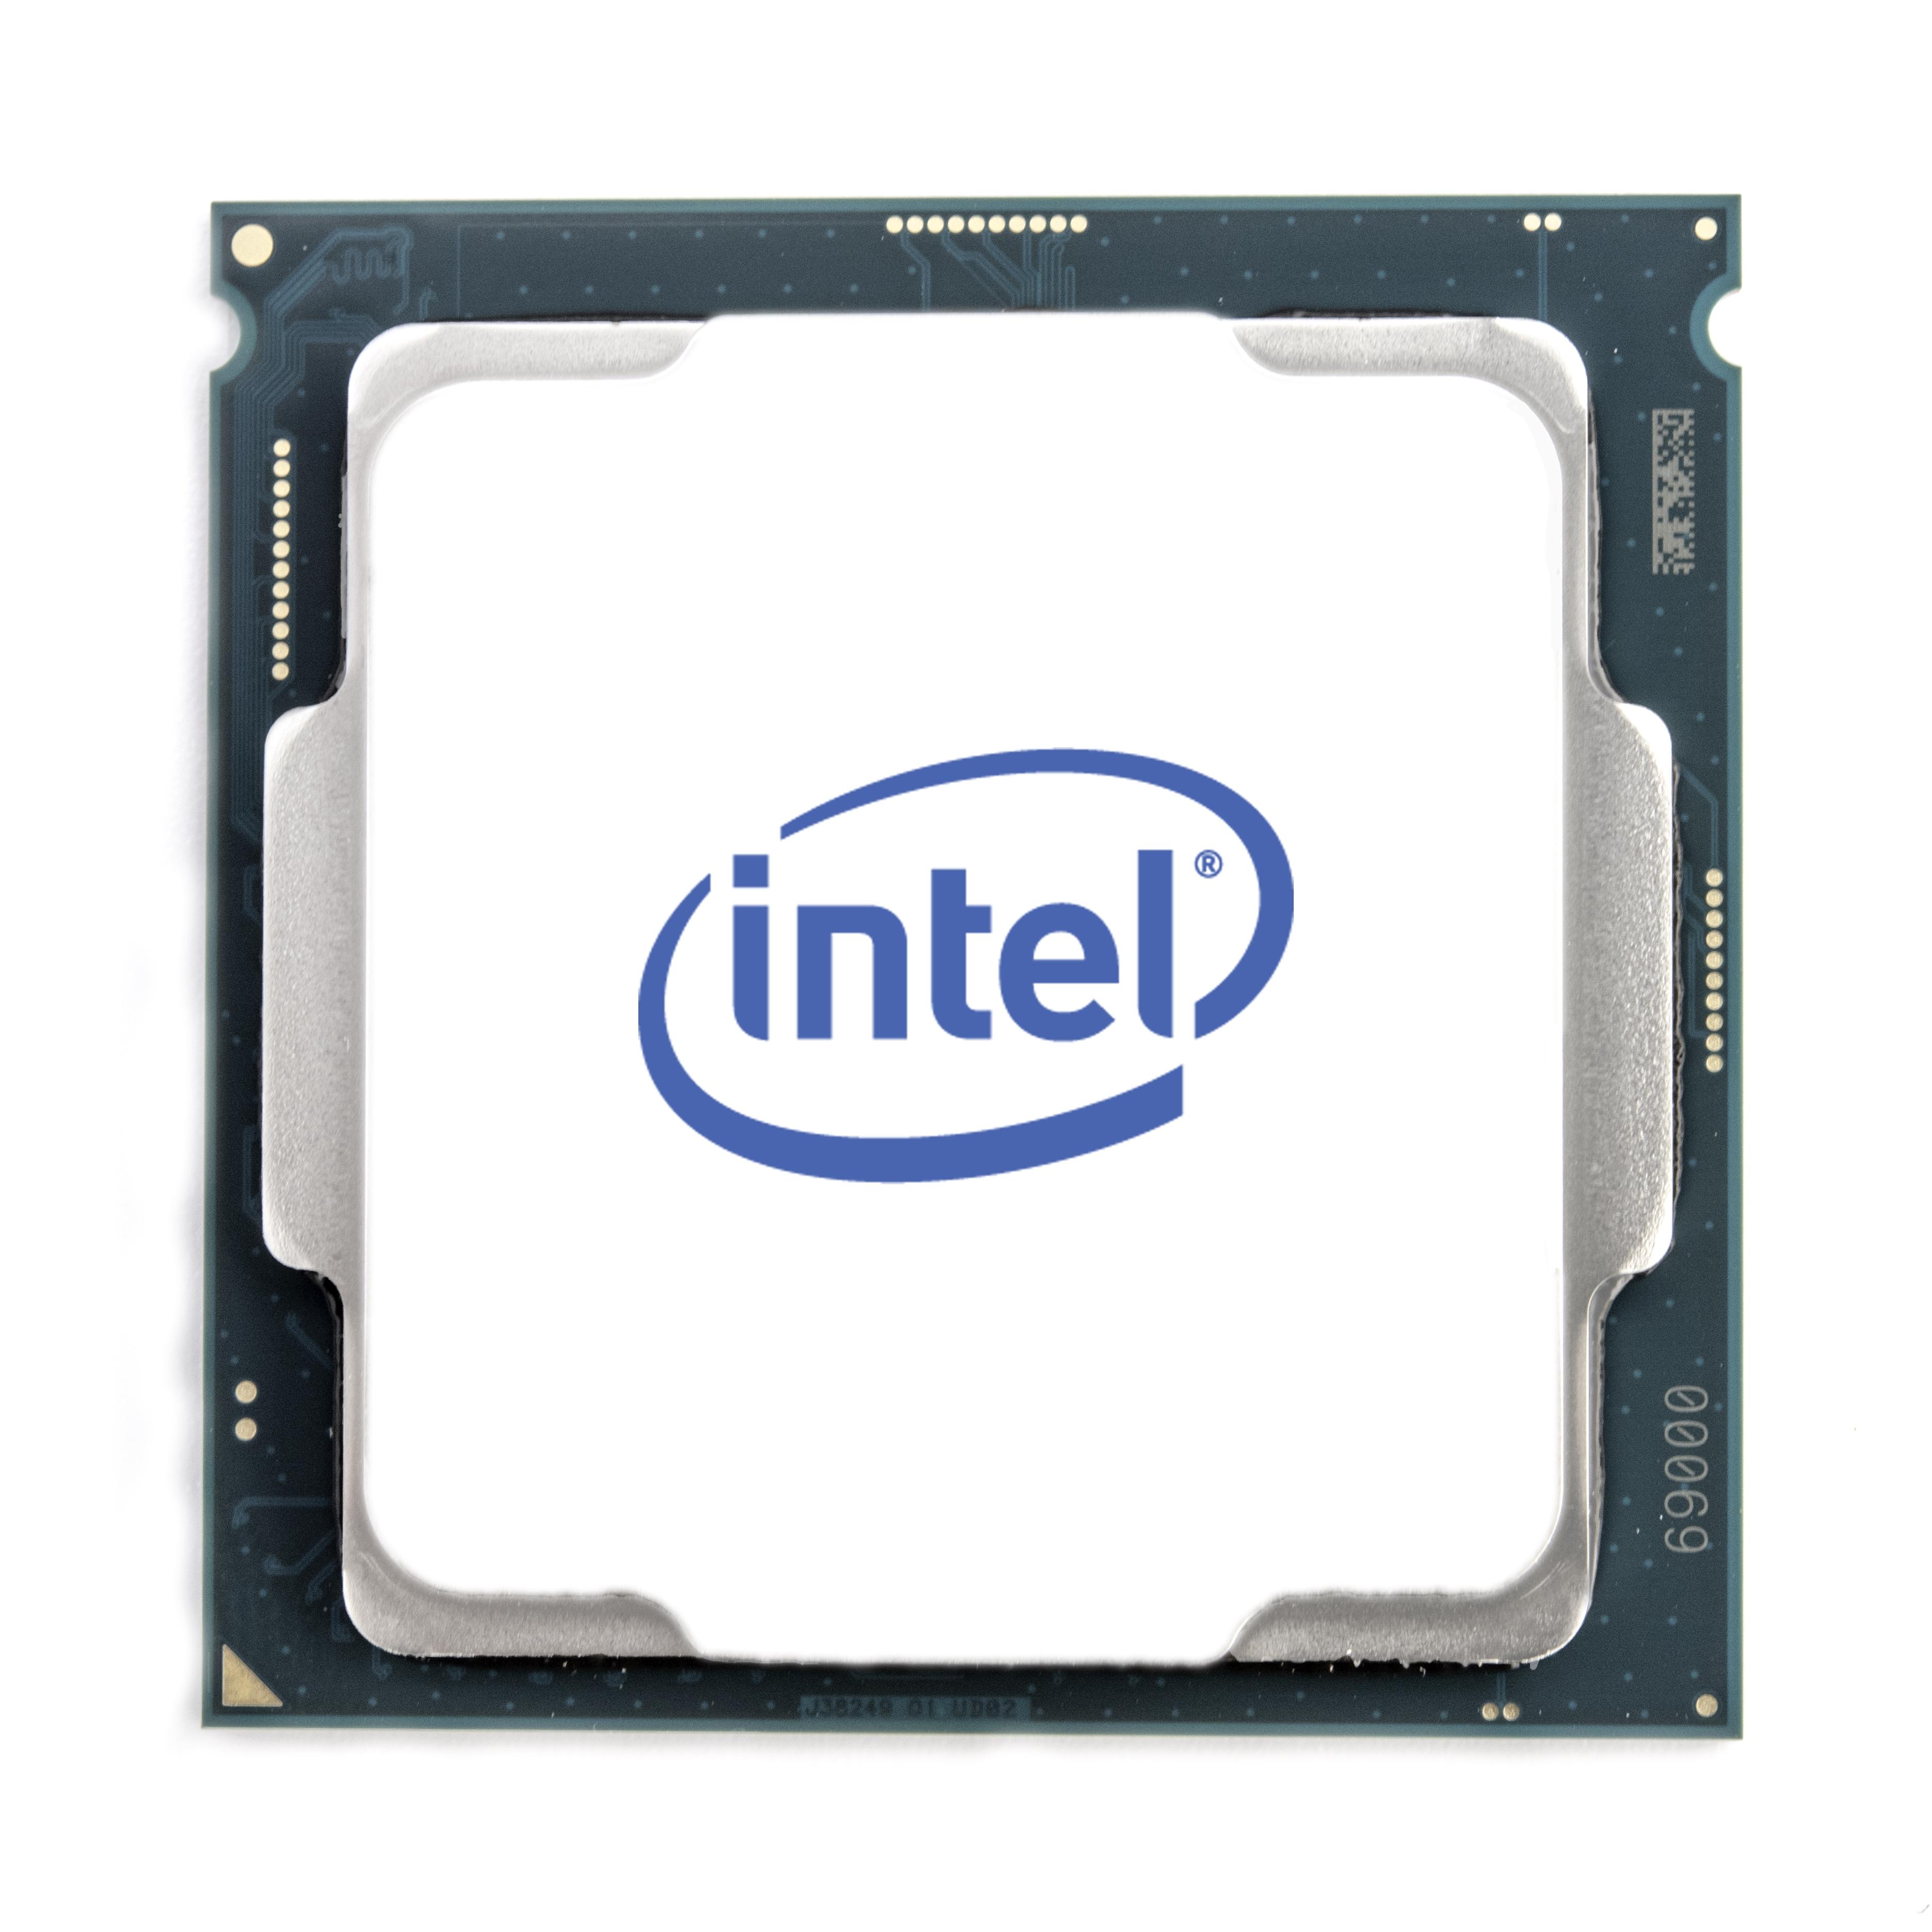 Intel Core i9-10850K - Intel? Core? i9 Prozessoren der 10. Generation - 3,6 GHz - LGA 1200 (Socket H5) - PC - 14 nm - In